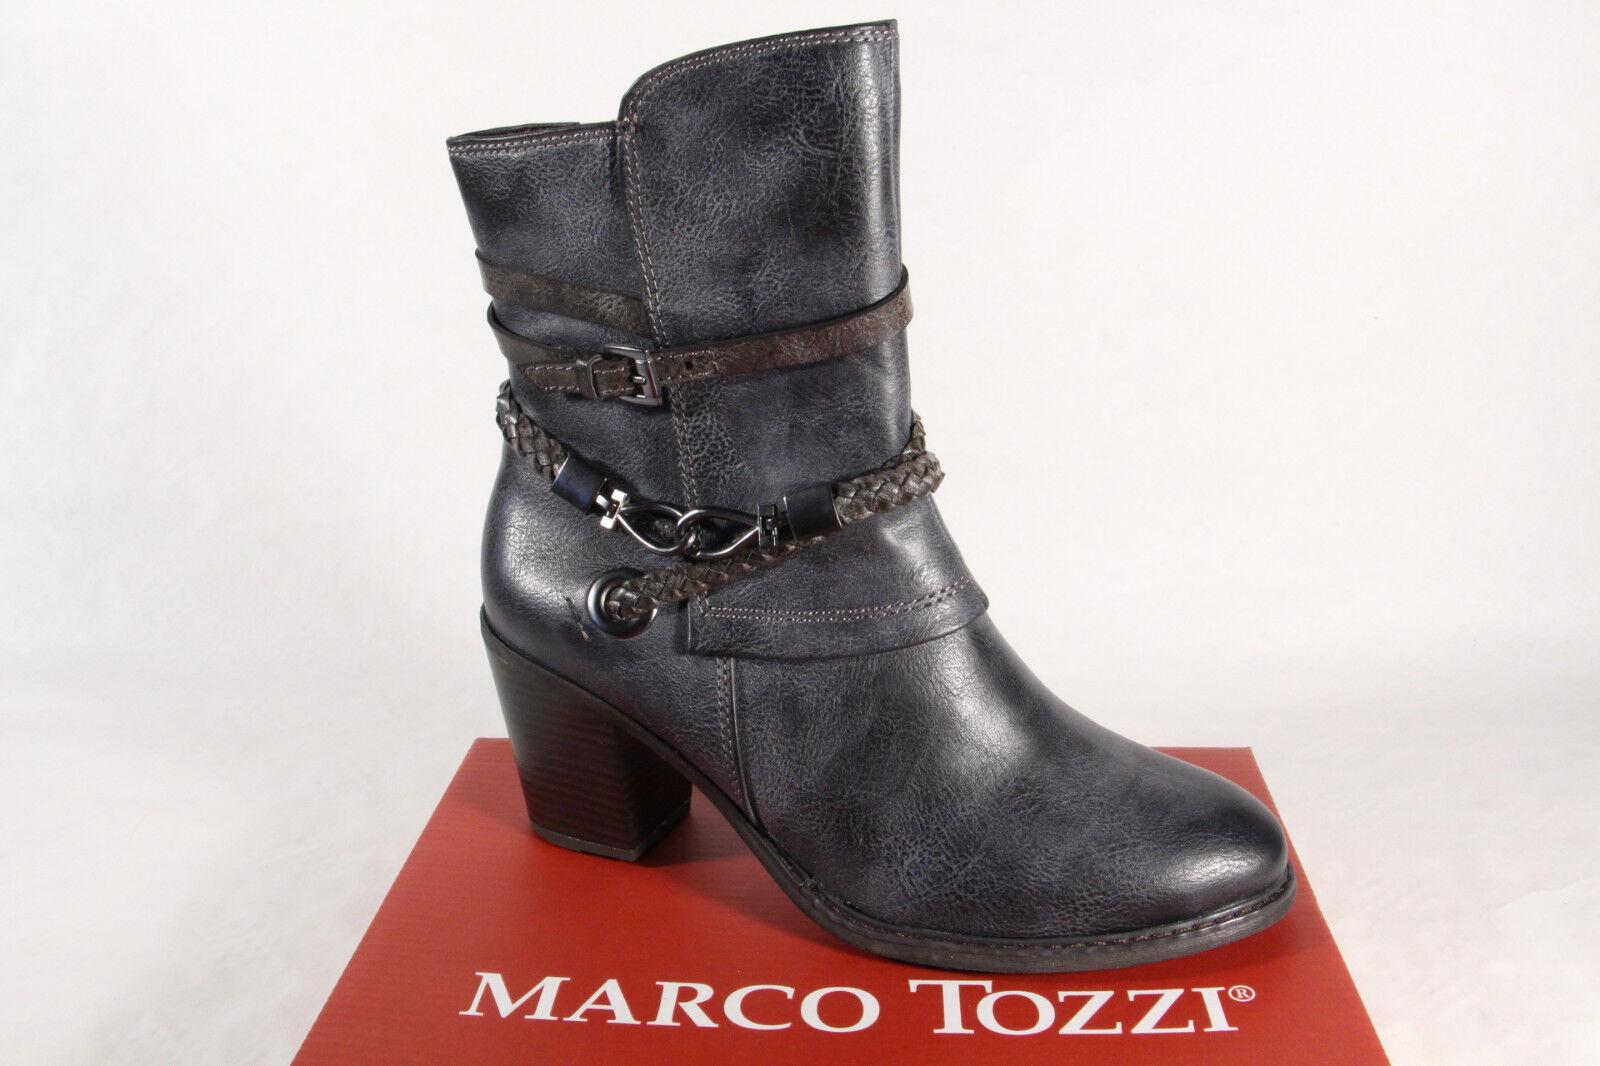 Marco Tozzi Damen Stiefel 25344 Stiefeletten Schnürstiefel, Stiefel navy blau NEU